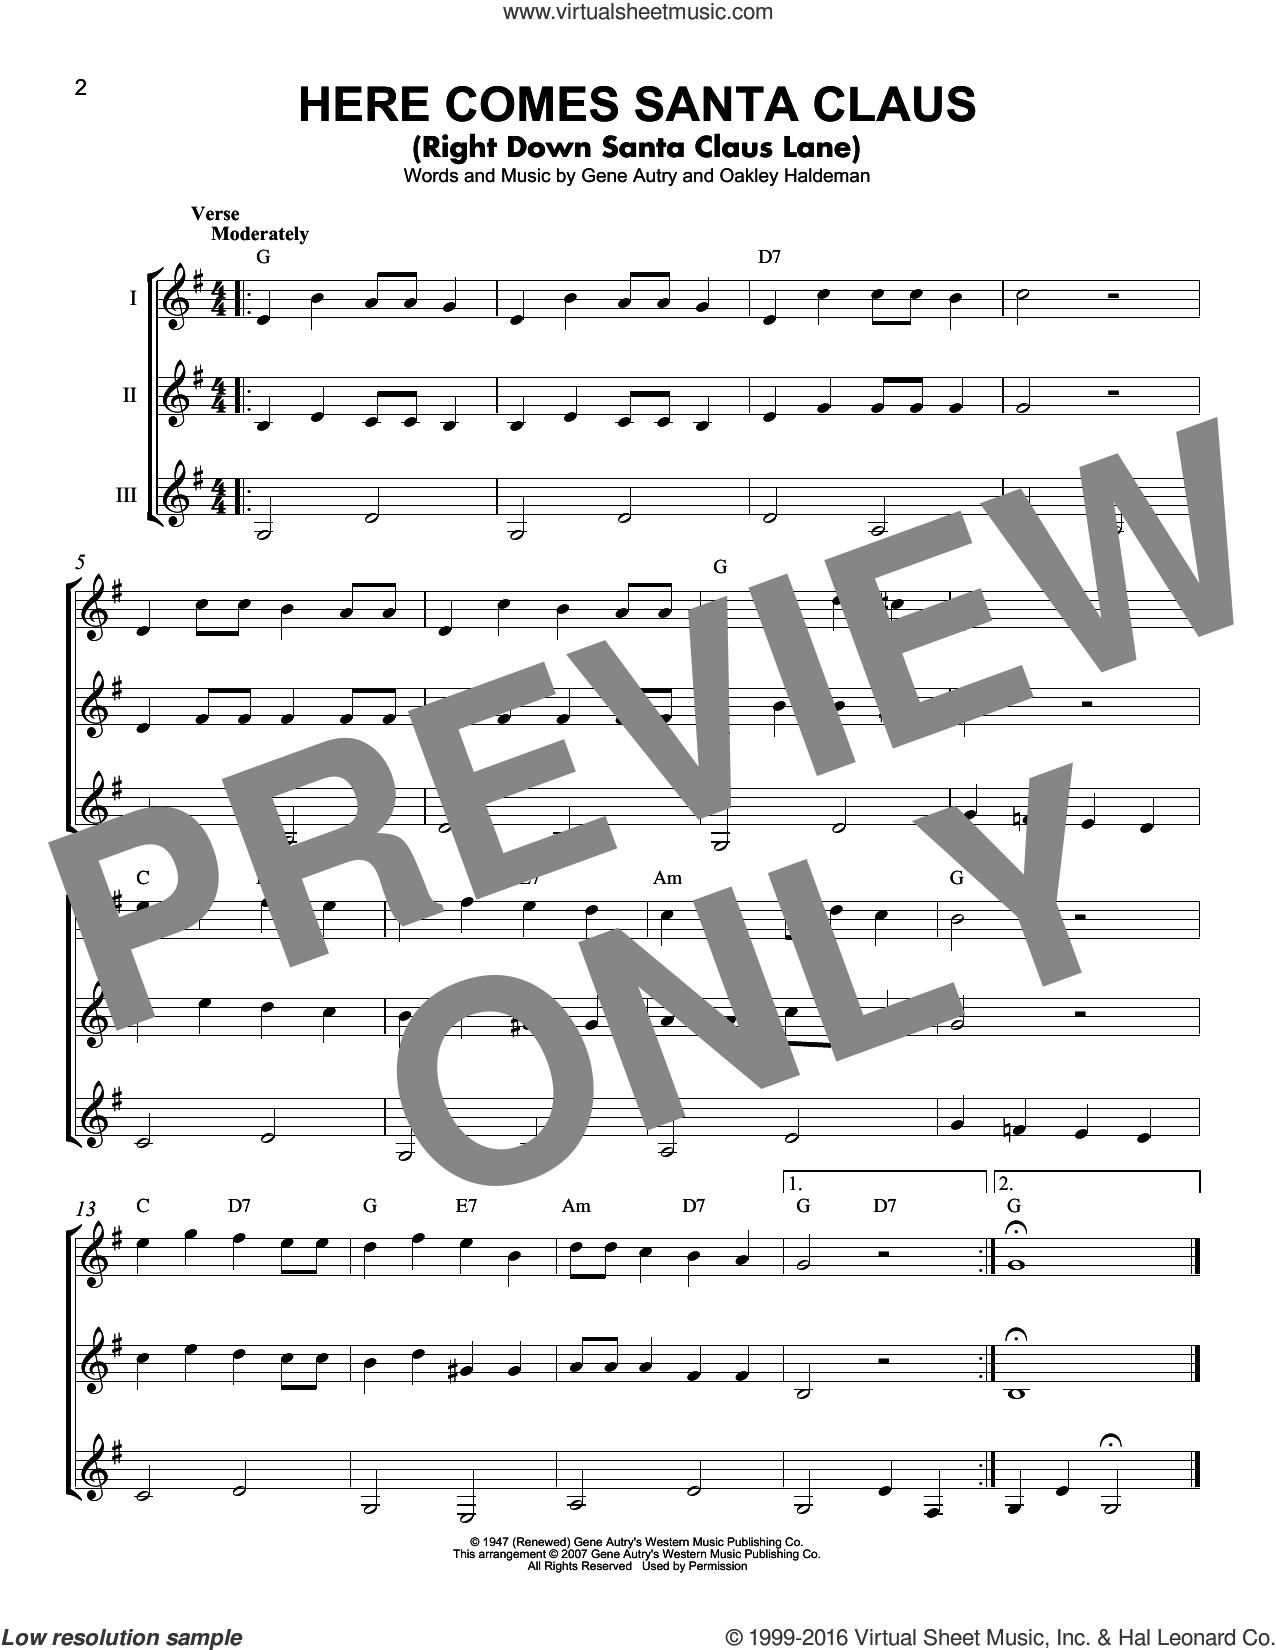 Here Comes Santa Claus (Right Down Santa Claus Lane) sheet music for guitar ensemble by Gene Autry, Carpenters and Oakley Haldeman, intermediate skill level